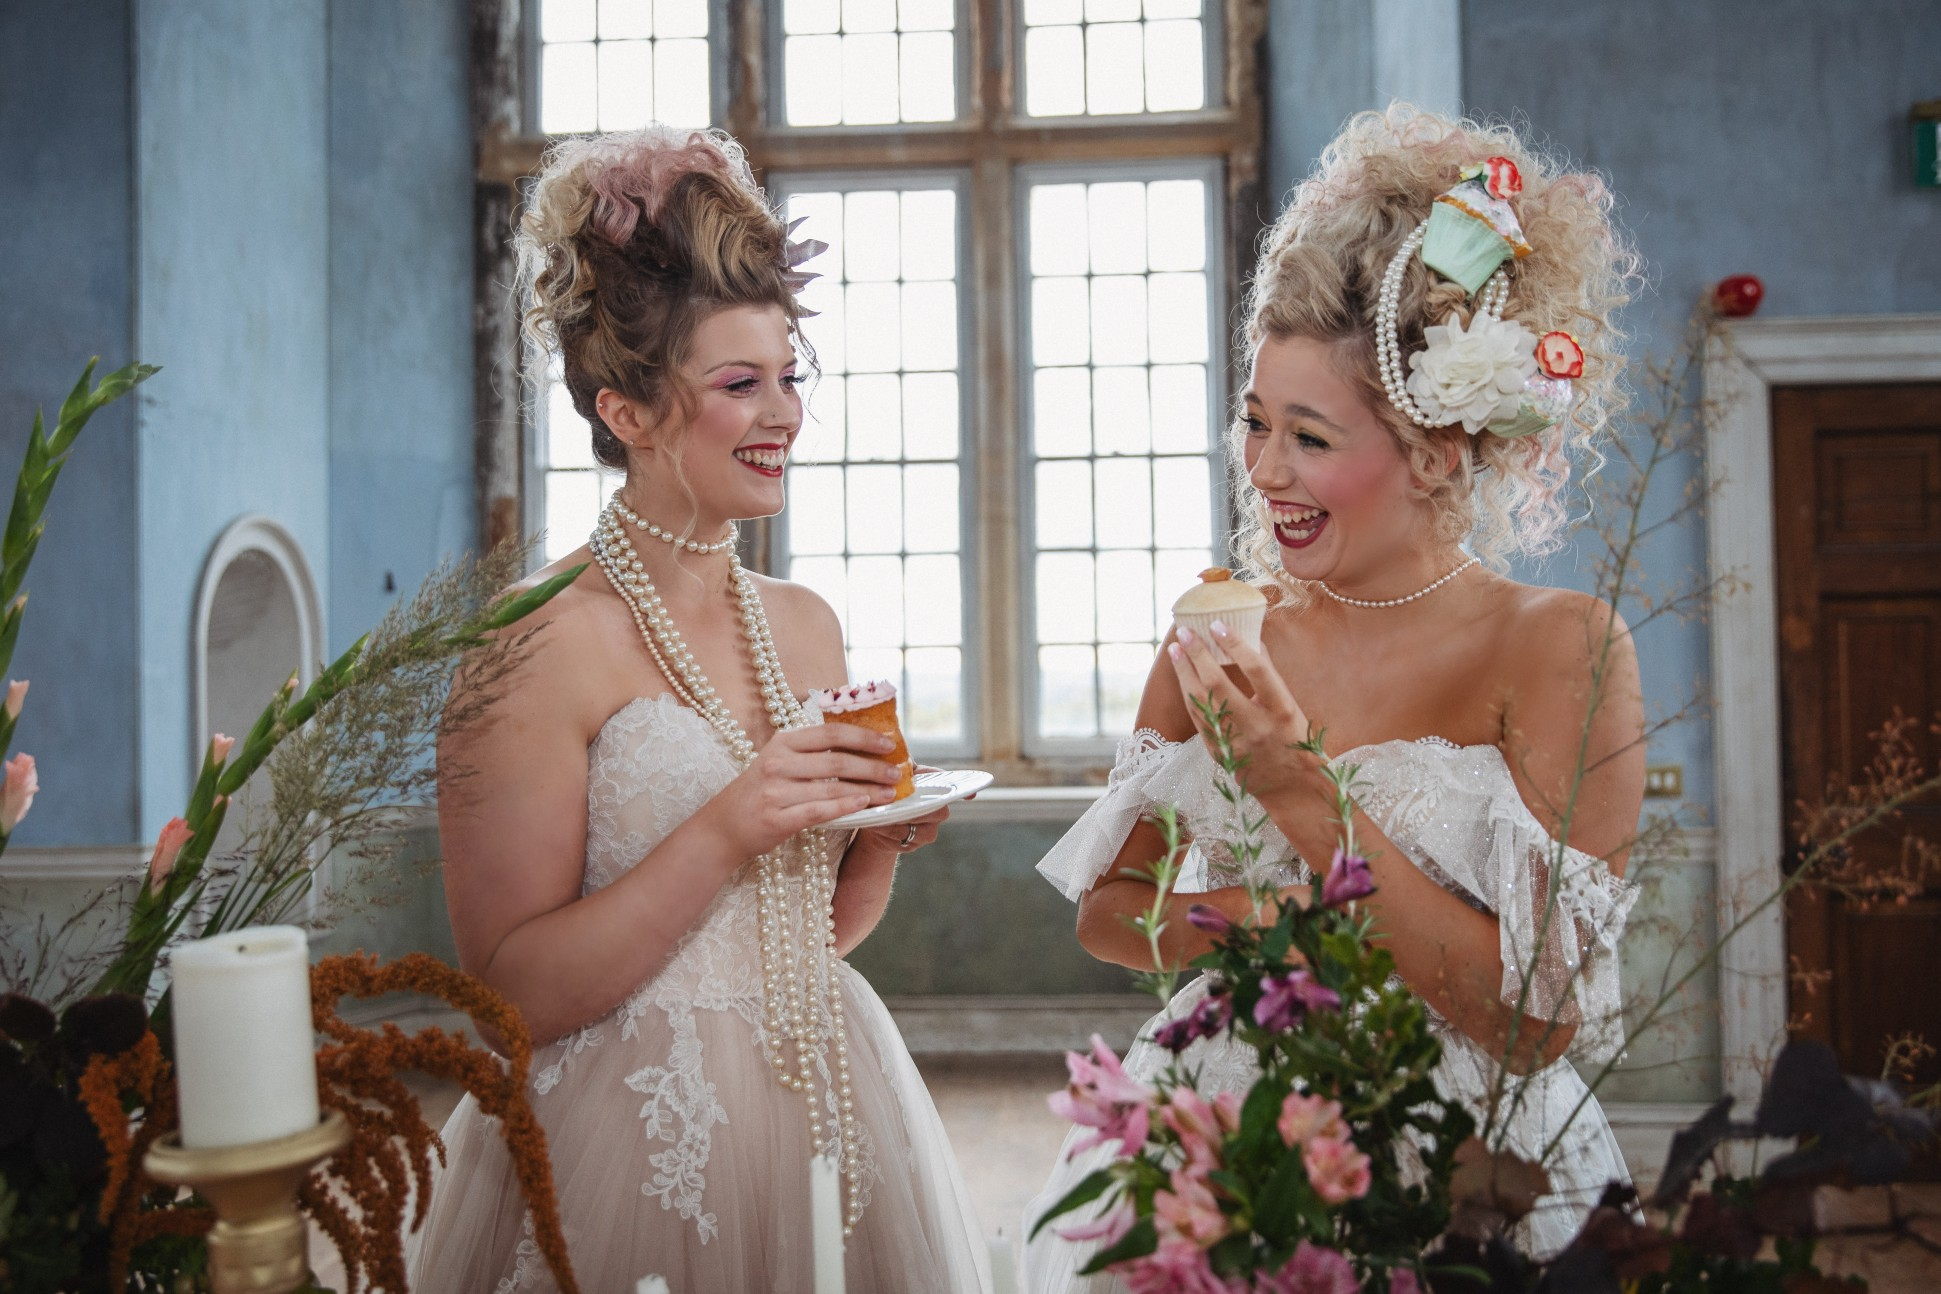 unique pastel wedding - marie antionette wedding - unique bridal look - unique bridal style - themed wedding - brides eating cake - wedding dessert table